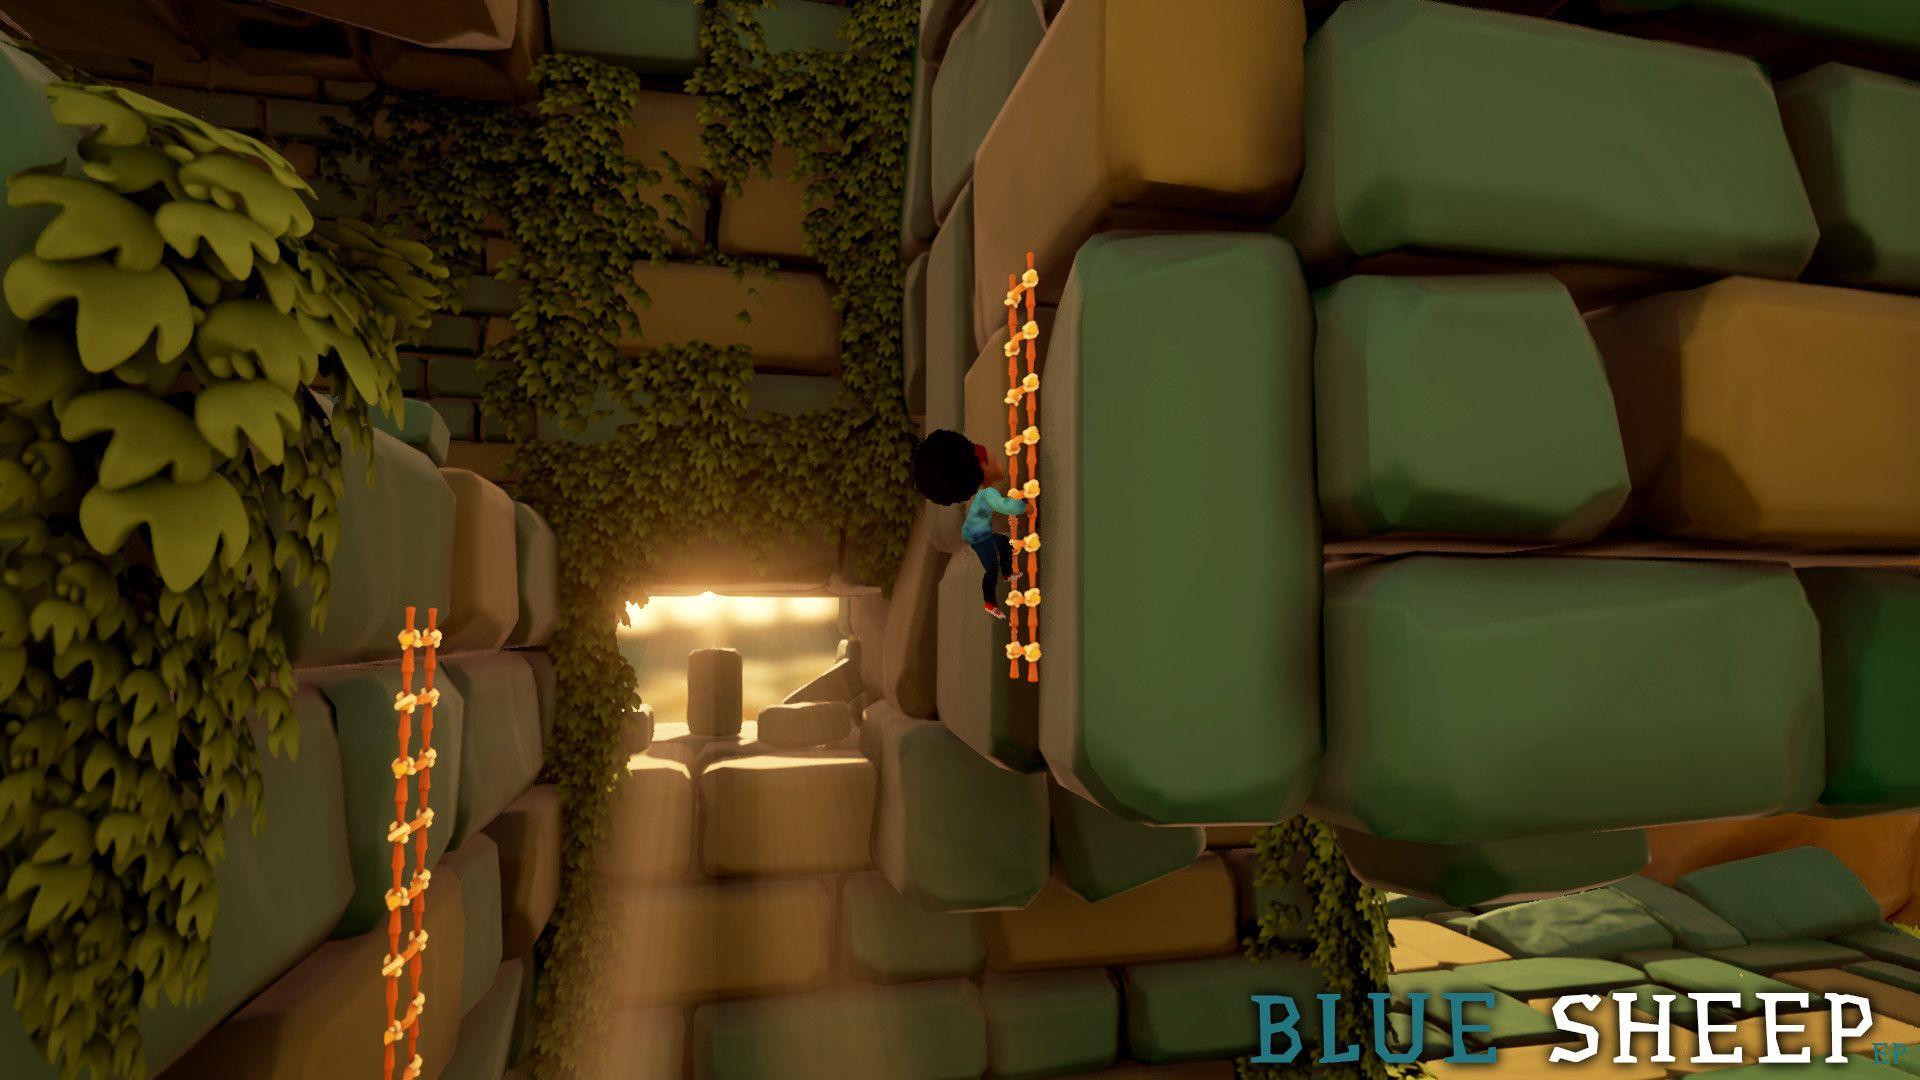 blue-sheep-screenshot-01